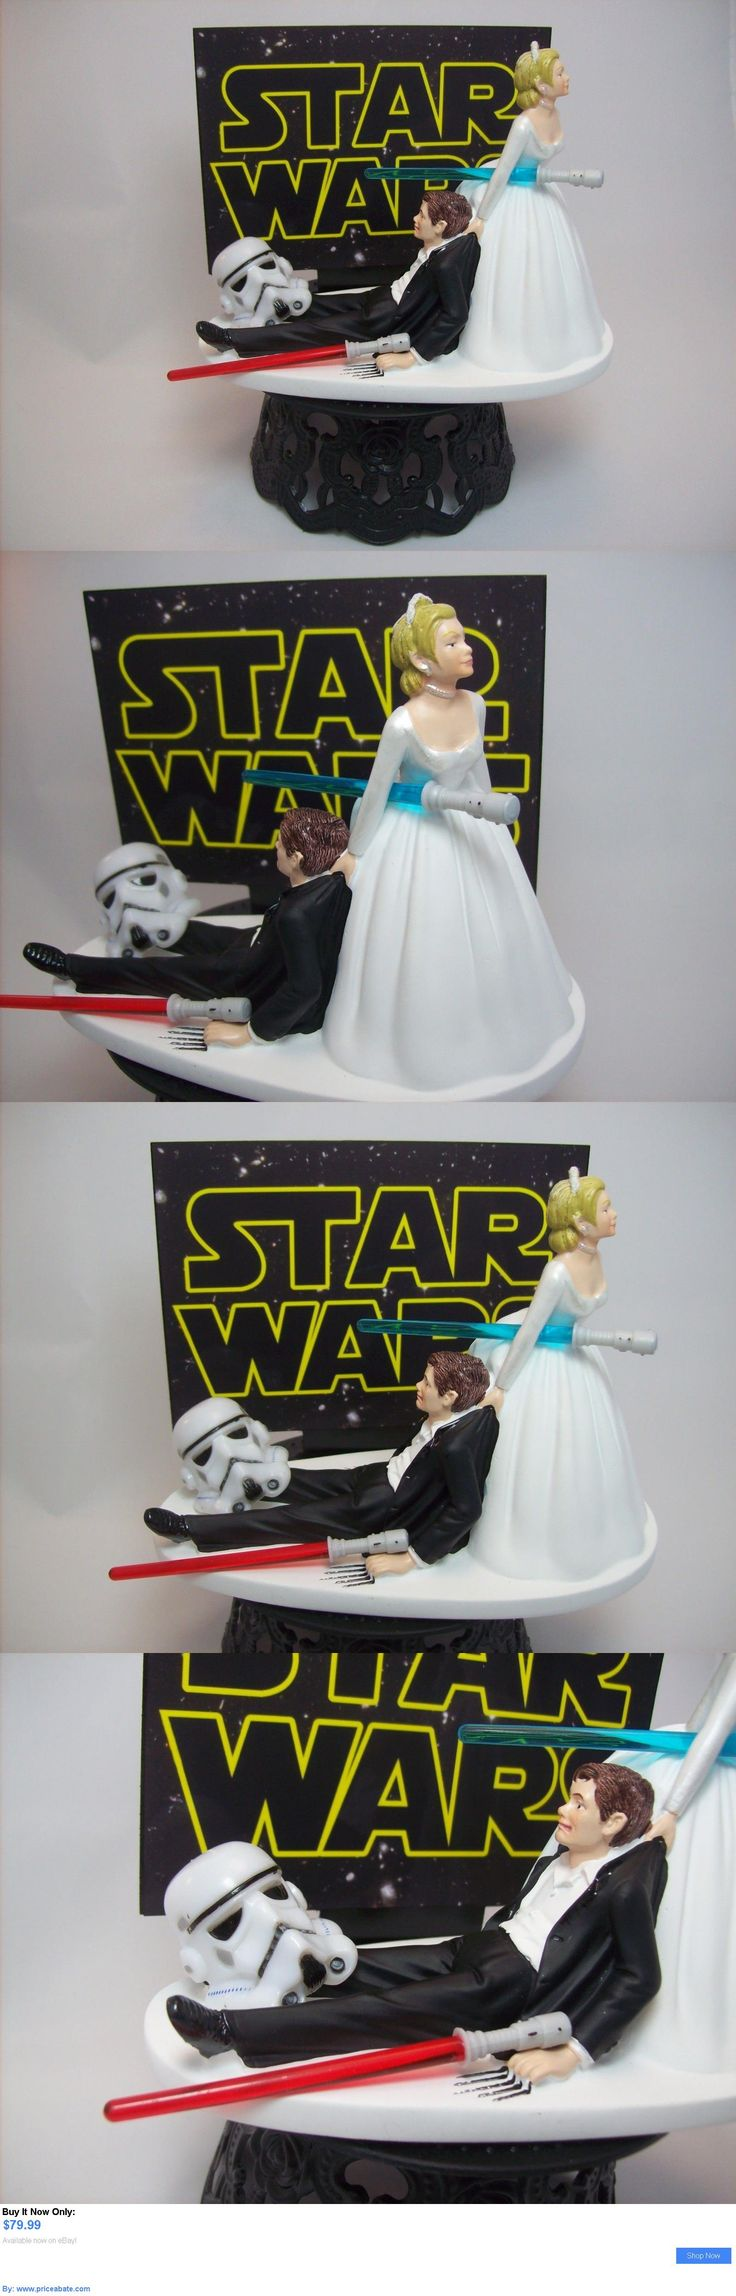 Wedding Cakes Toppers: Star Wars Stormtrooper Bride And Groom Funny Wedding Cake Topper Jedi Lightsaber BUY IT NOW ONLY: $79.99 #priceabateWeddingCakesToppers OR #priceabate